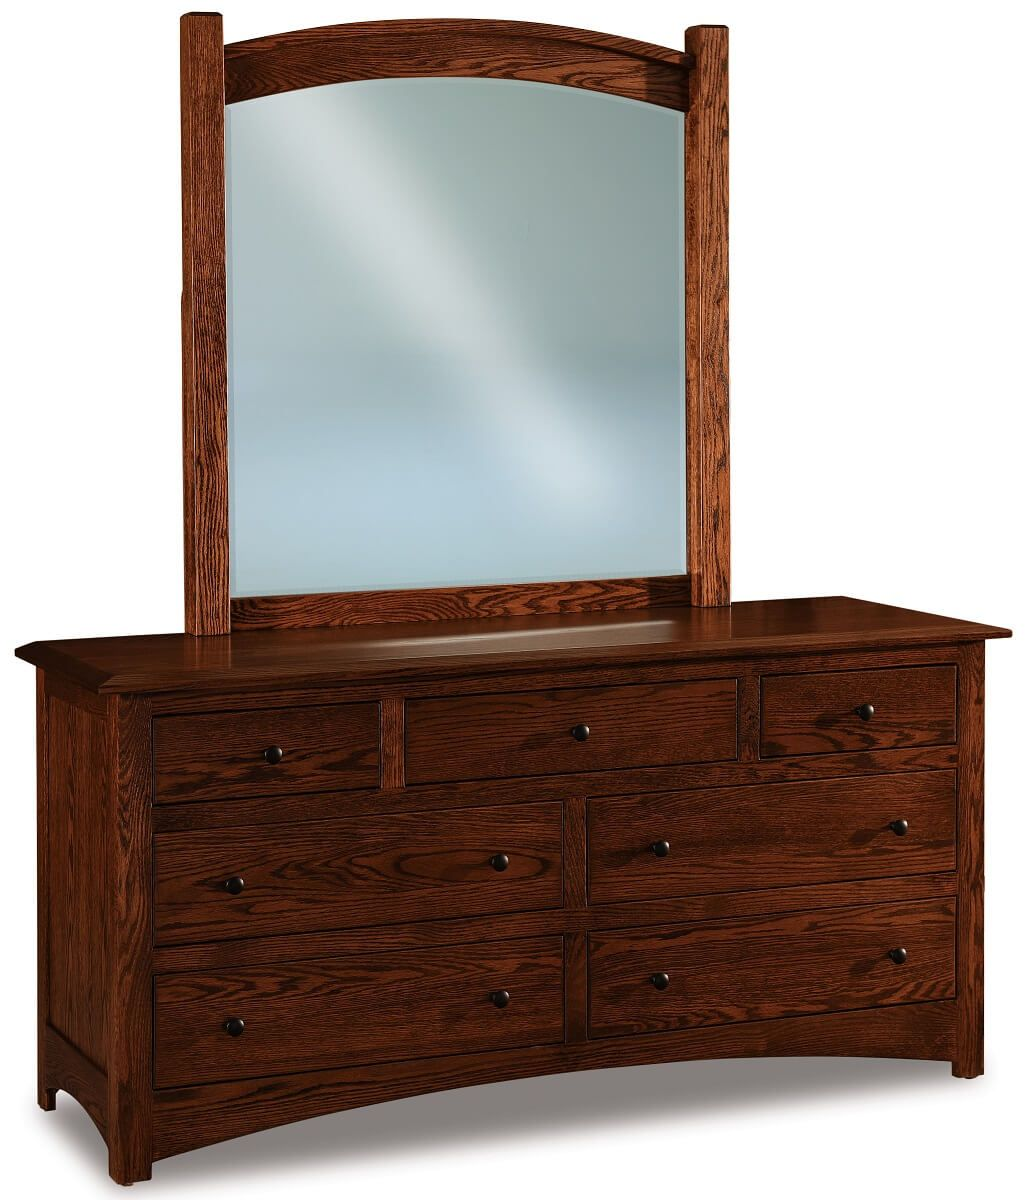 Norway Low Mirrored Dresser